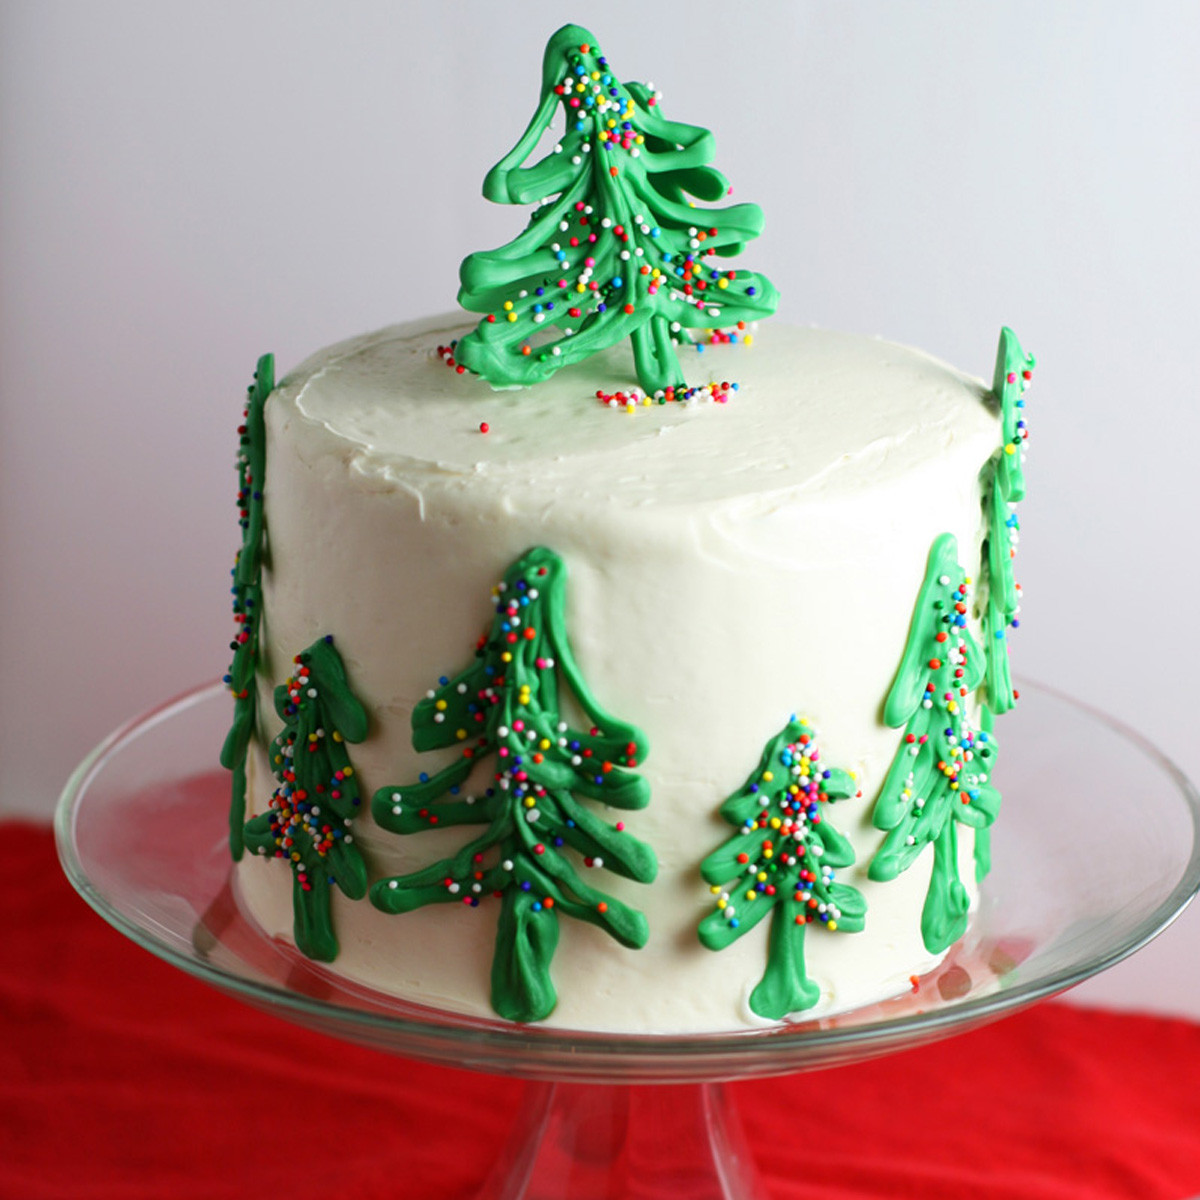 Cakes For Christmas  Chocolate Christmas Tree Cake Mom Loves Baking